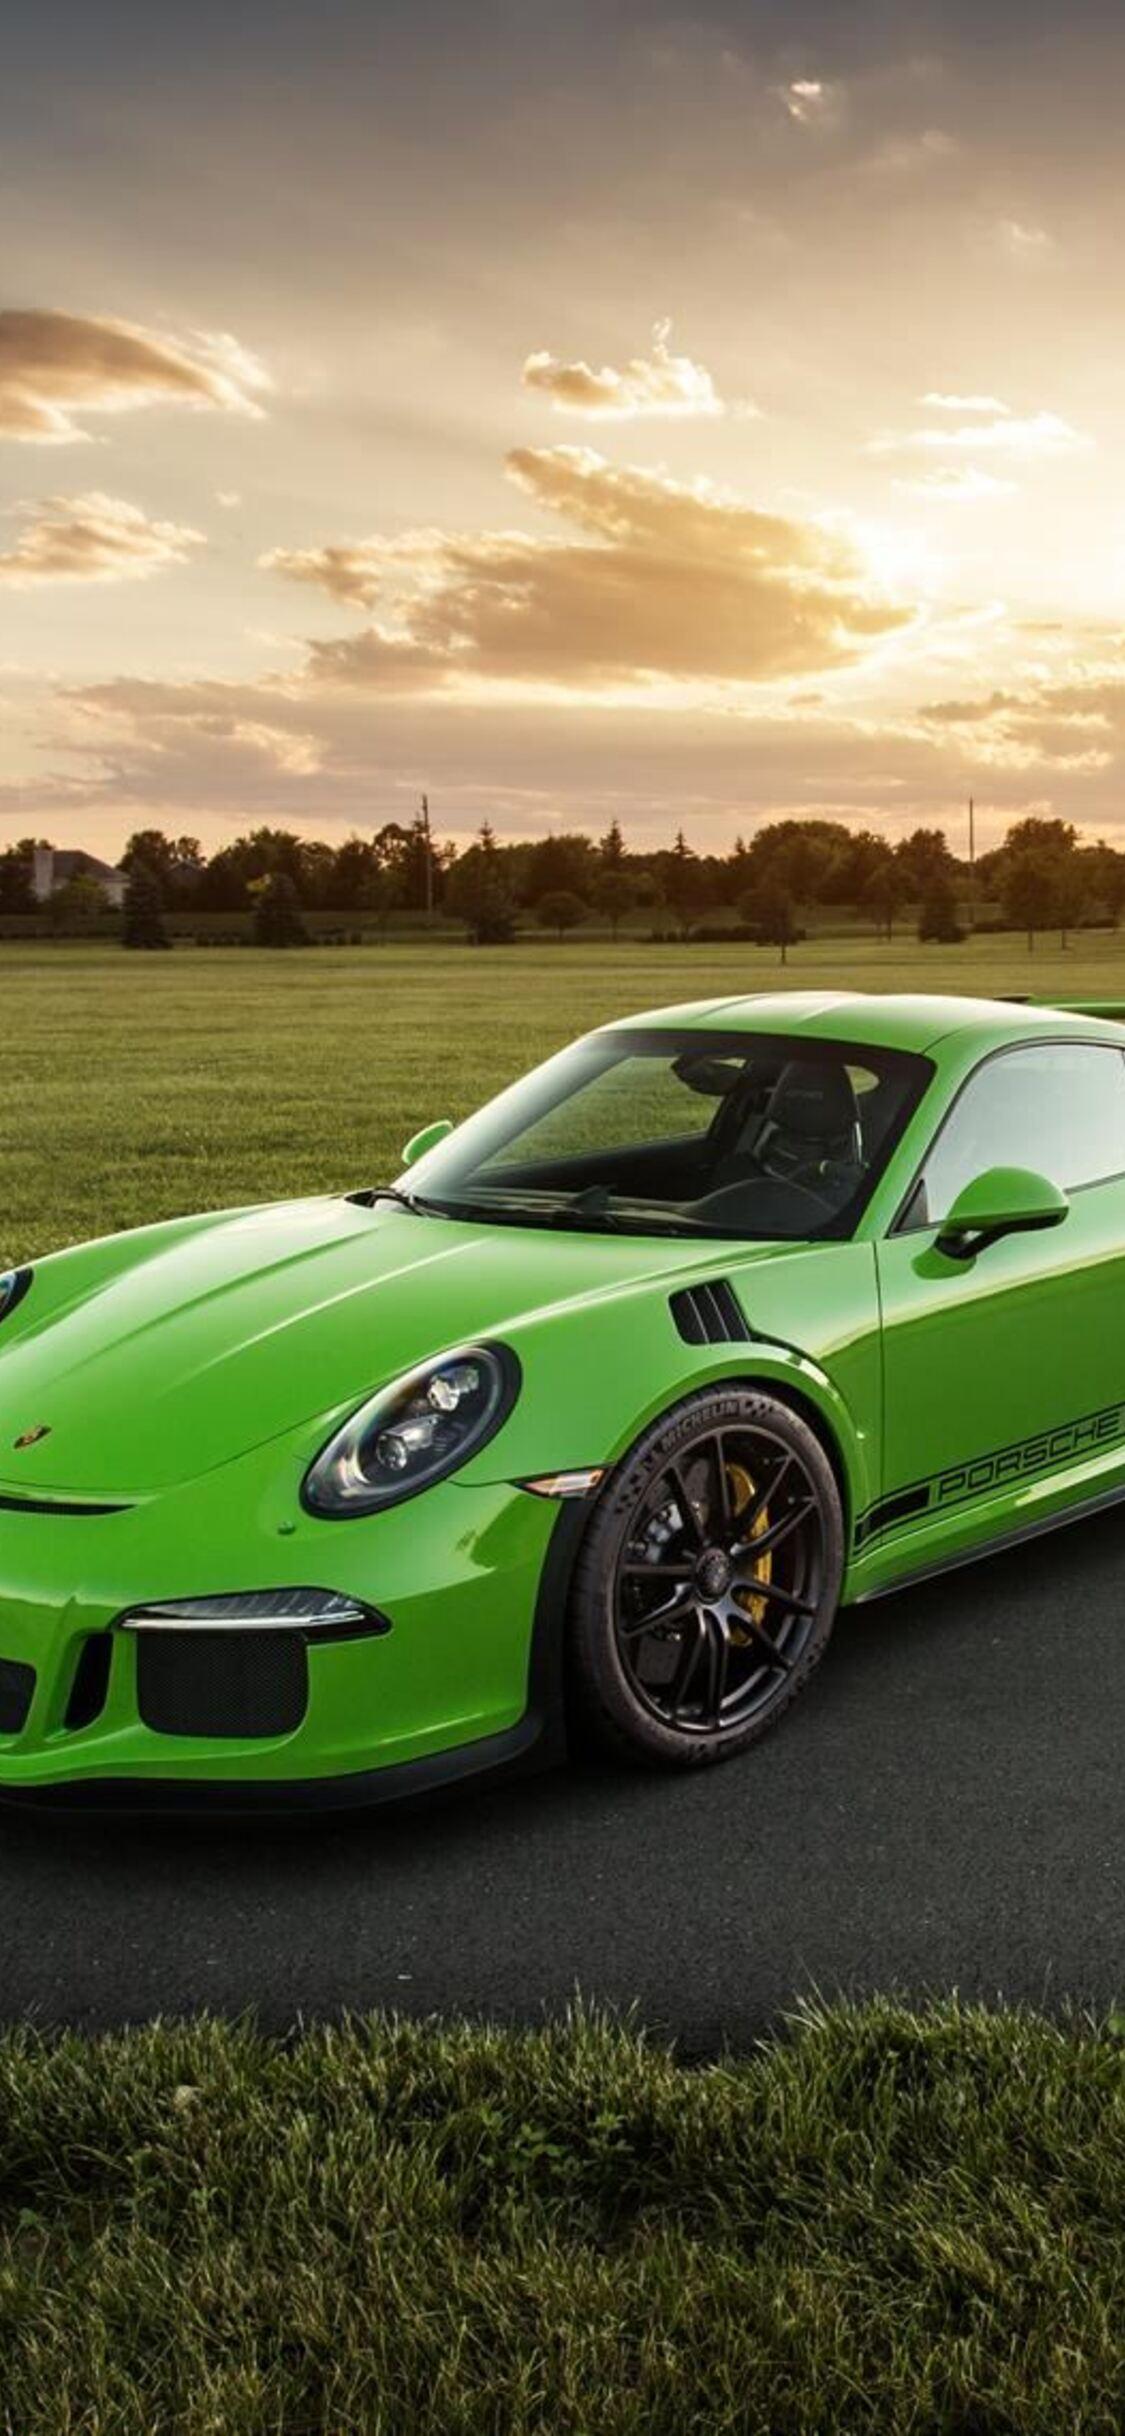 1125x2436 Porsche 911 Gt3 Rs Iphone Xs Iphone 10 Iphone X Hd 4k